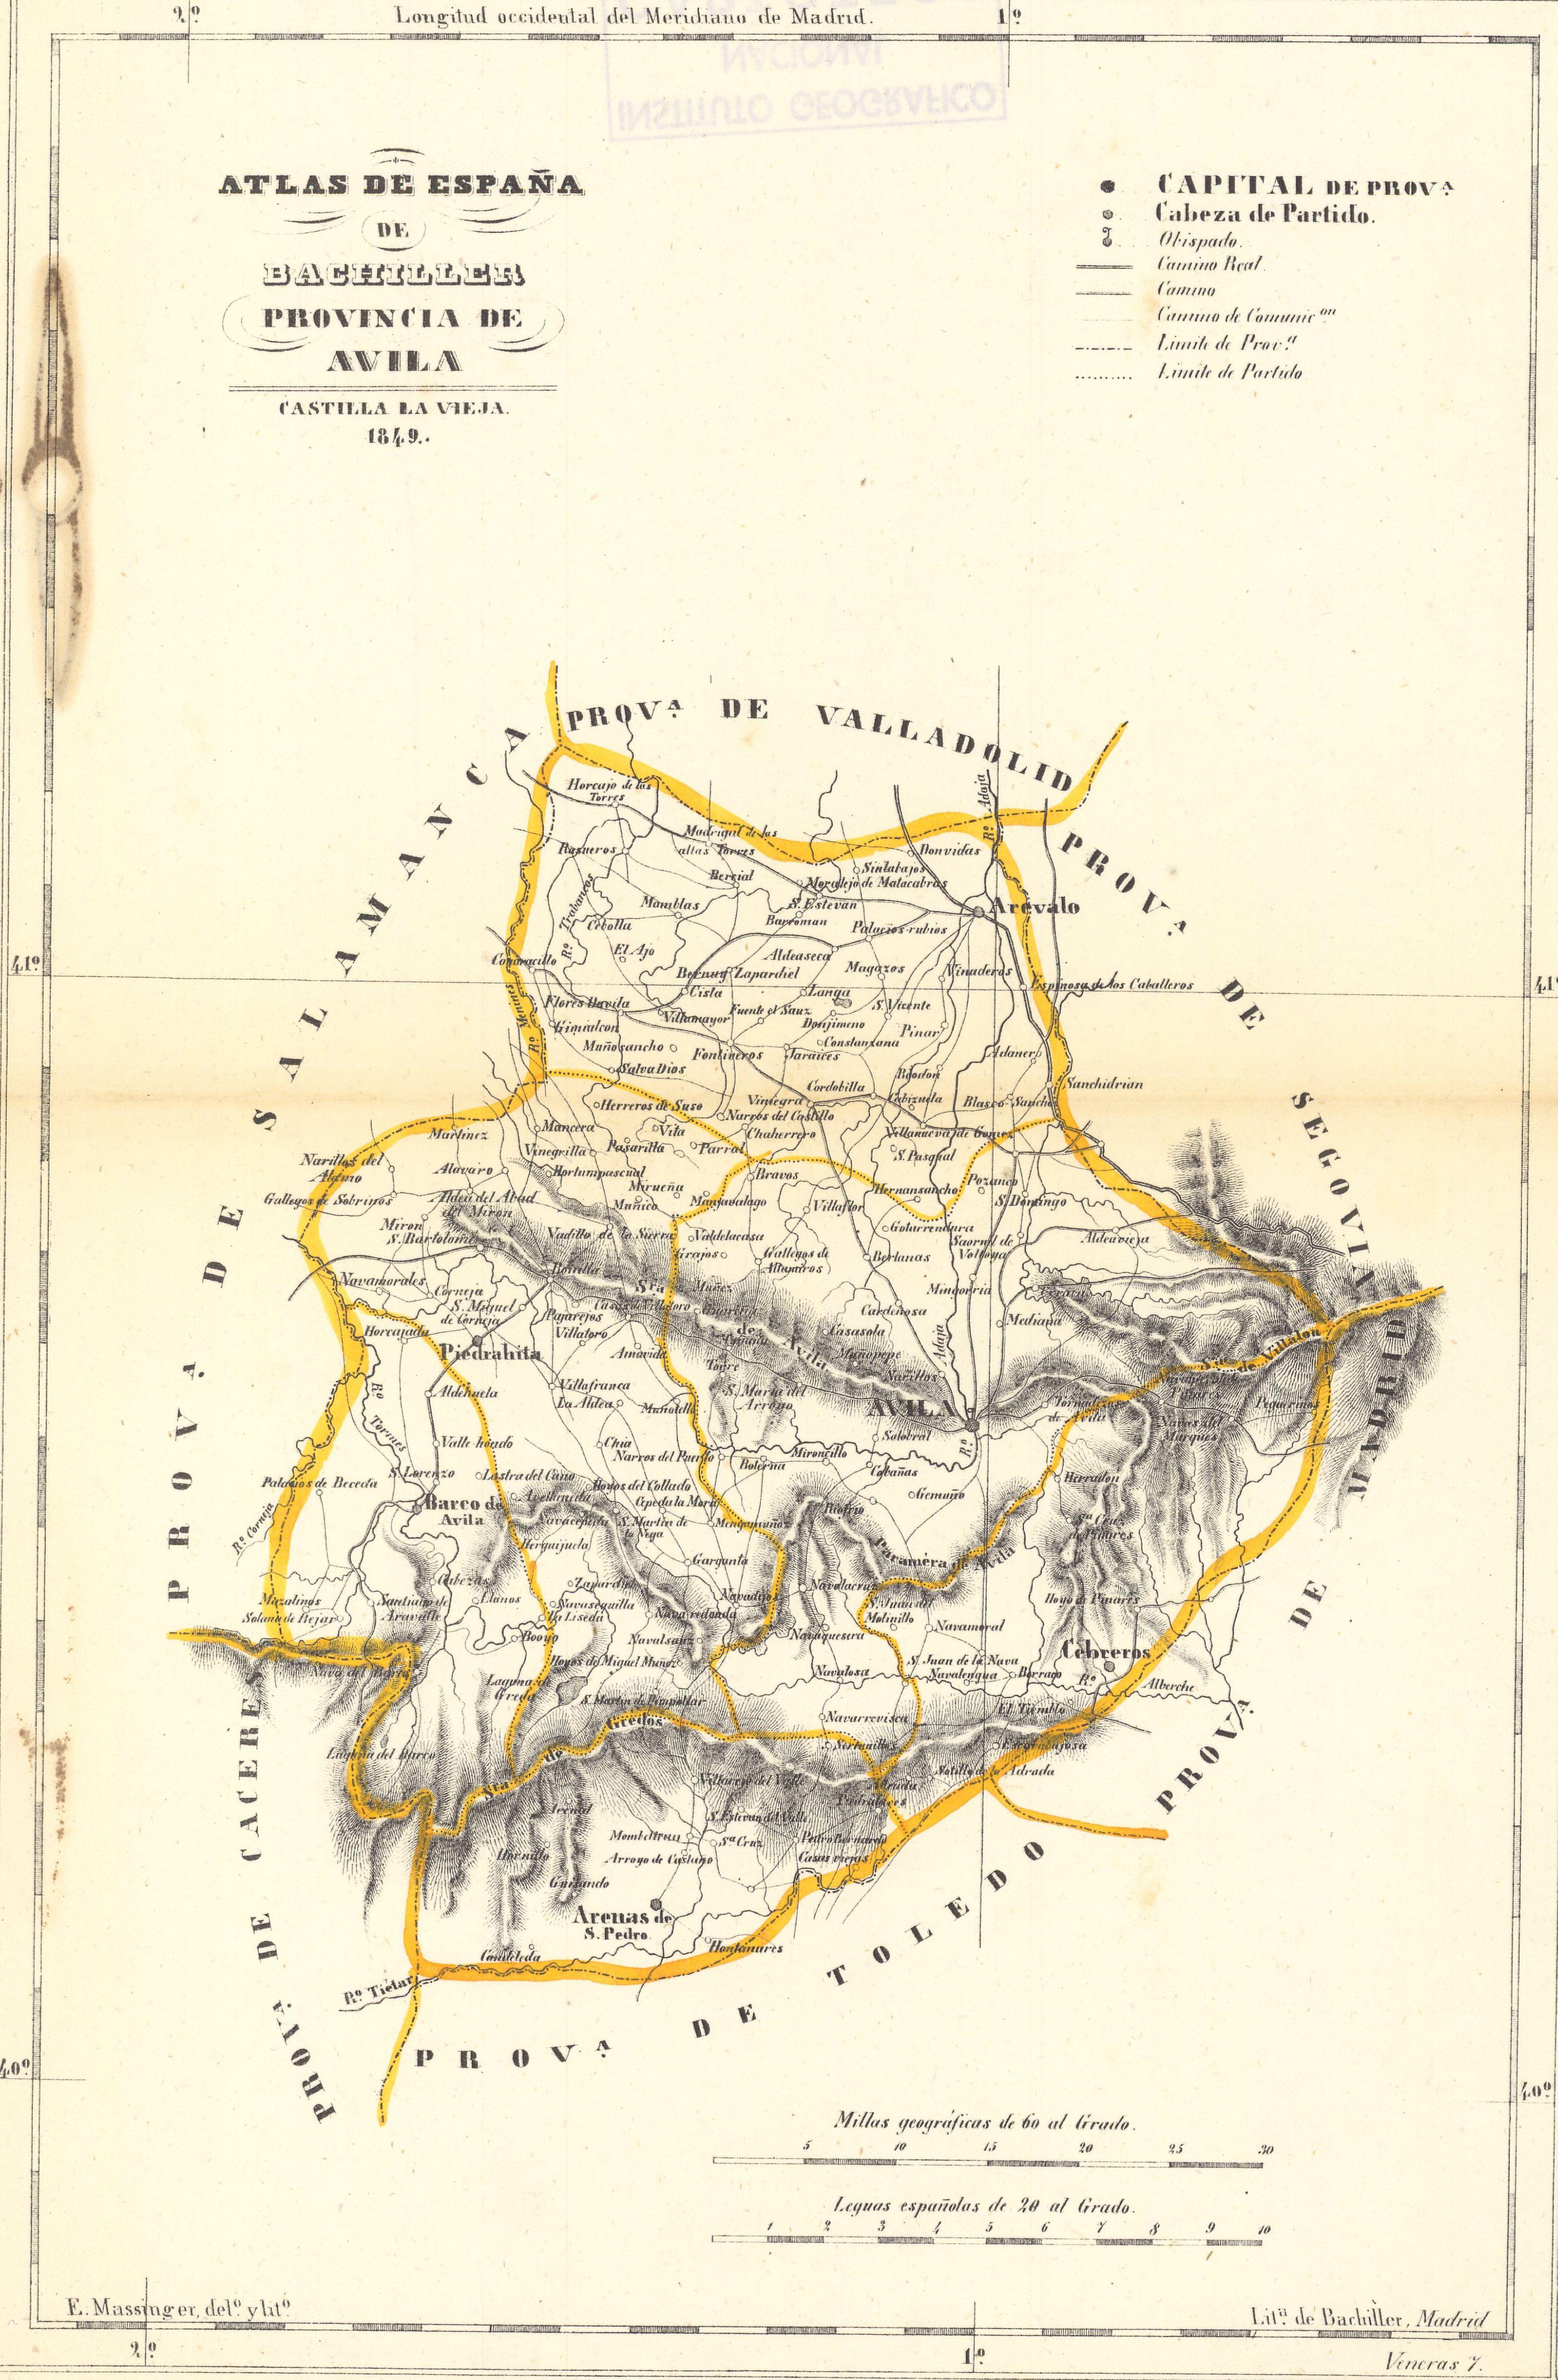 Archivo Mapa De Avila En 1849 Jpg Wikipedia La Enciclopedia Libre